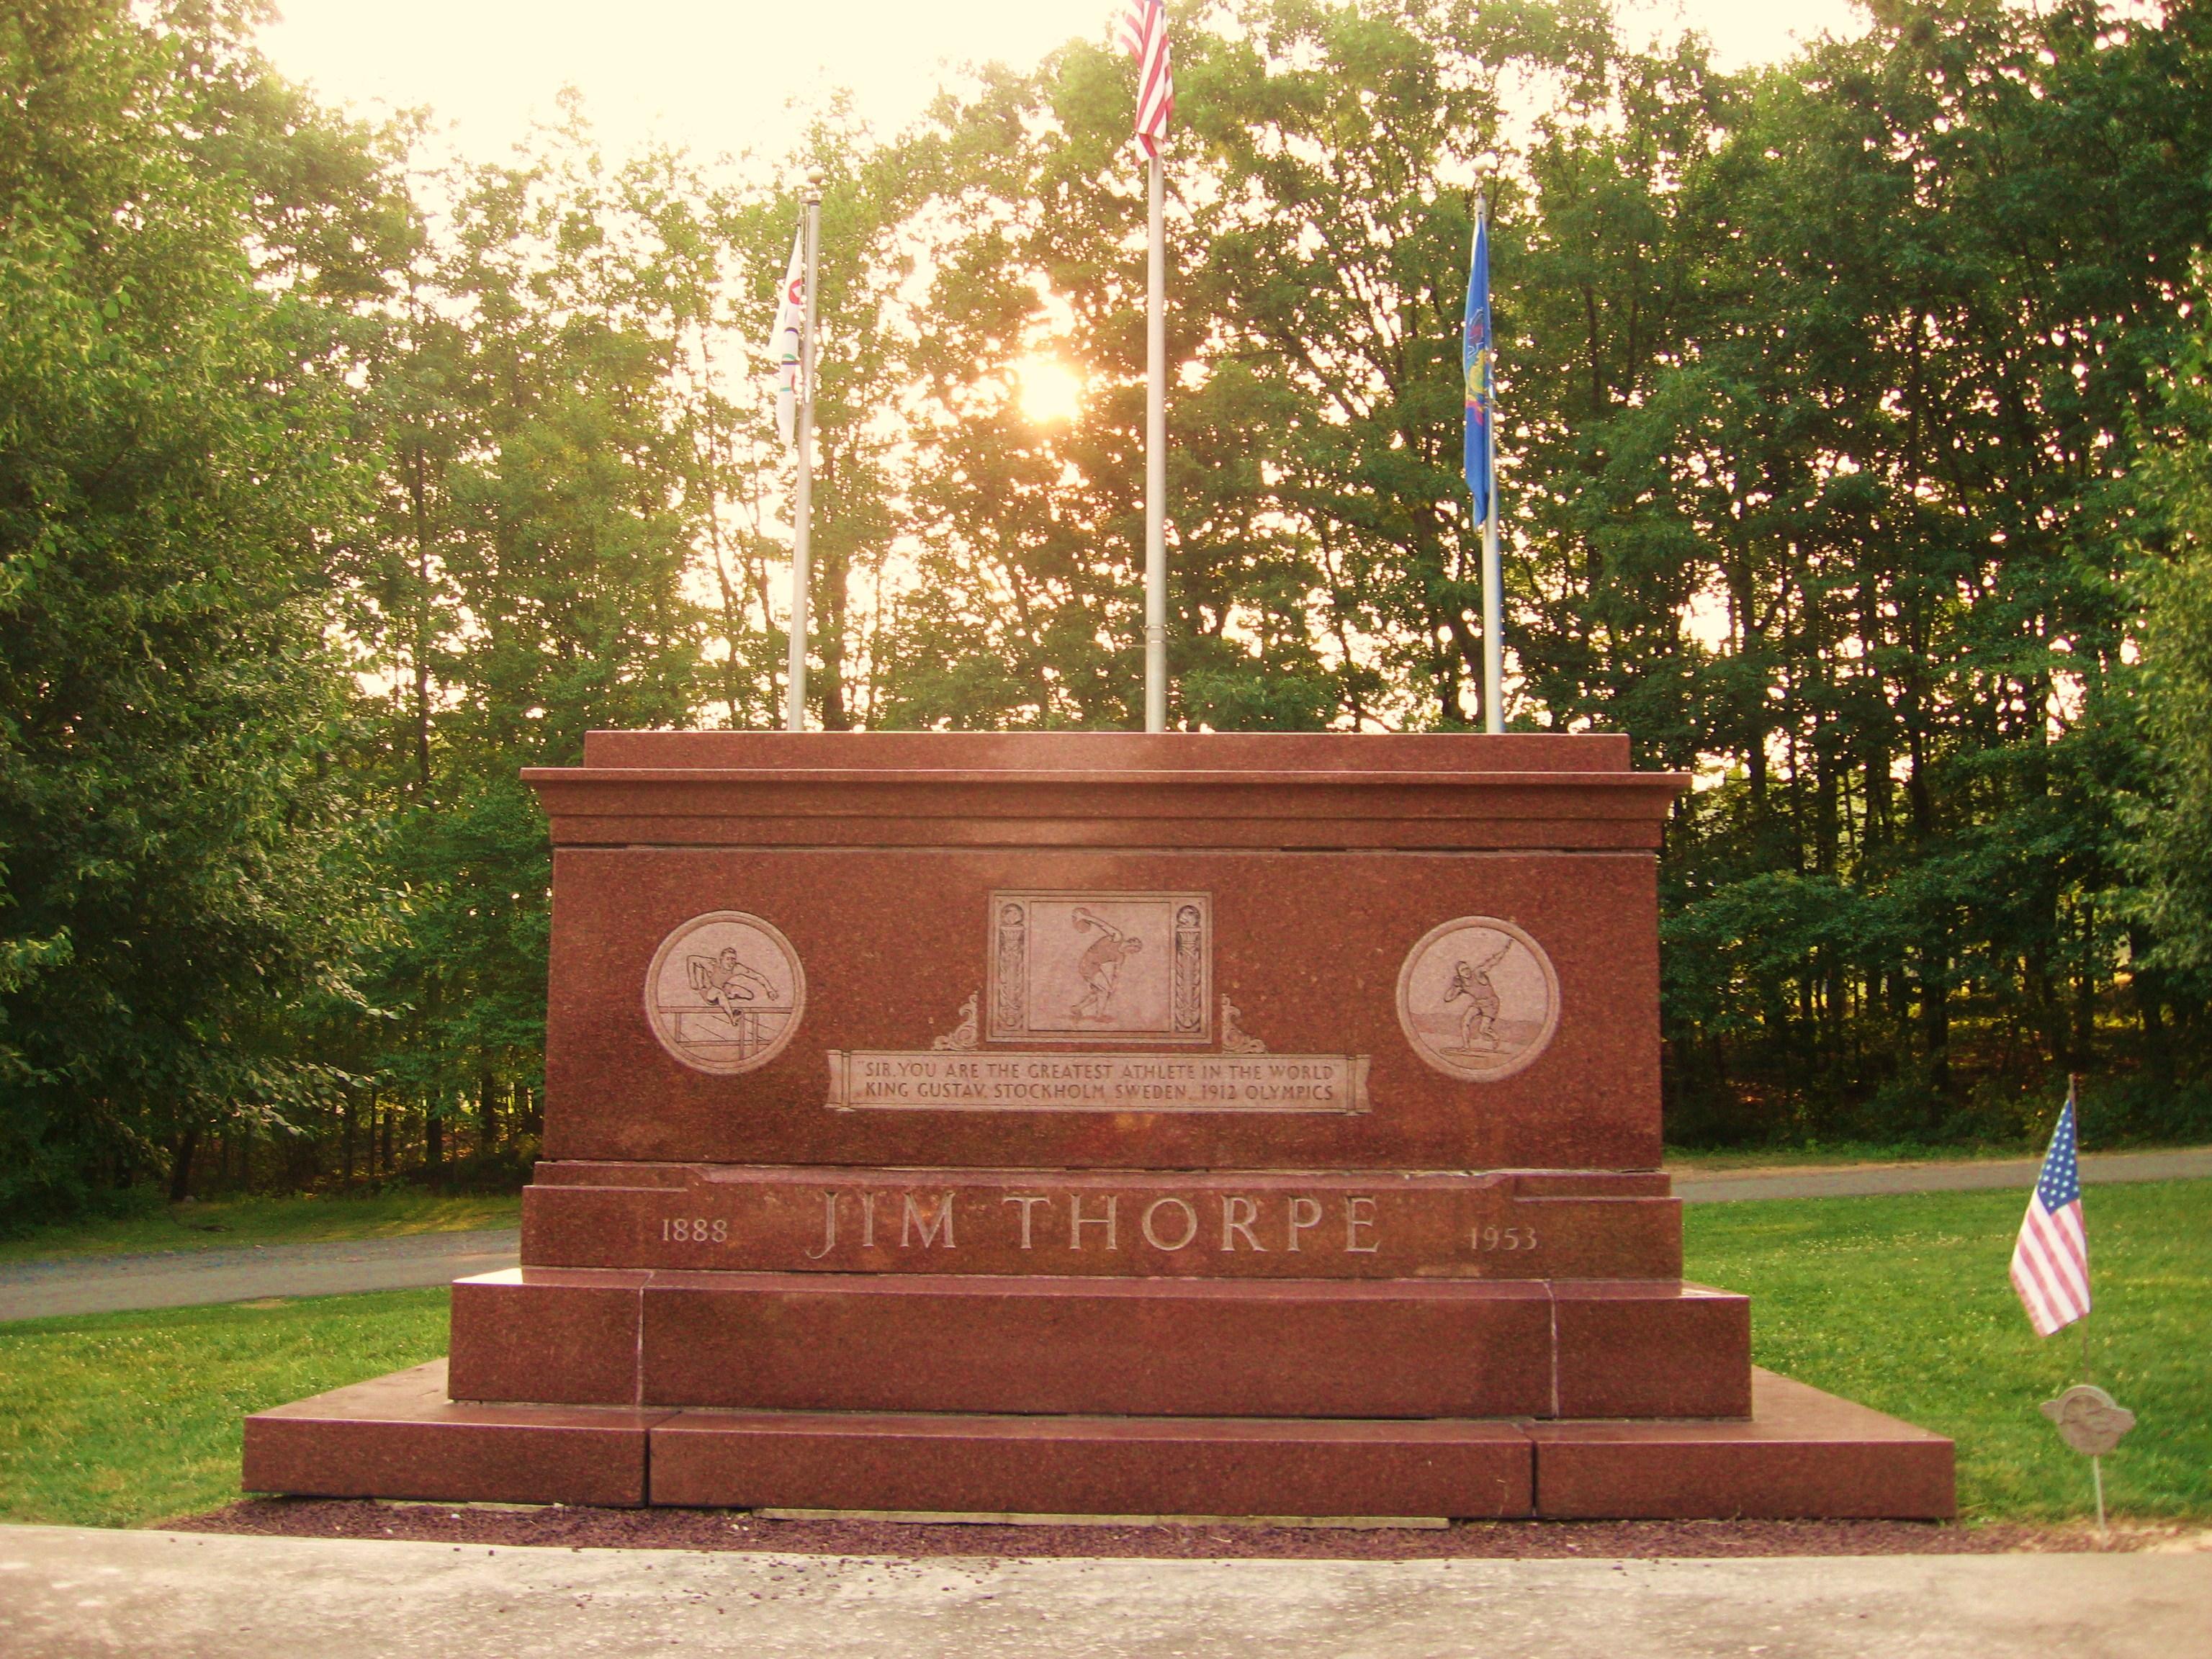 Jim Thorpe Burial site